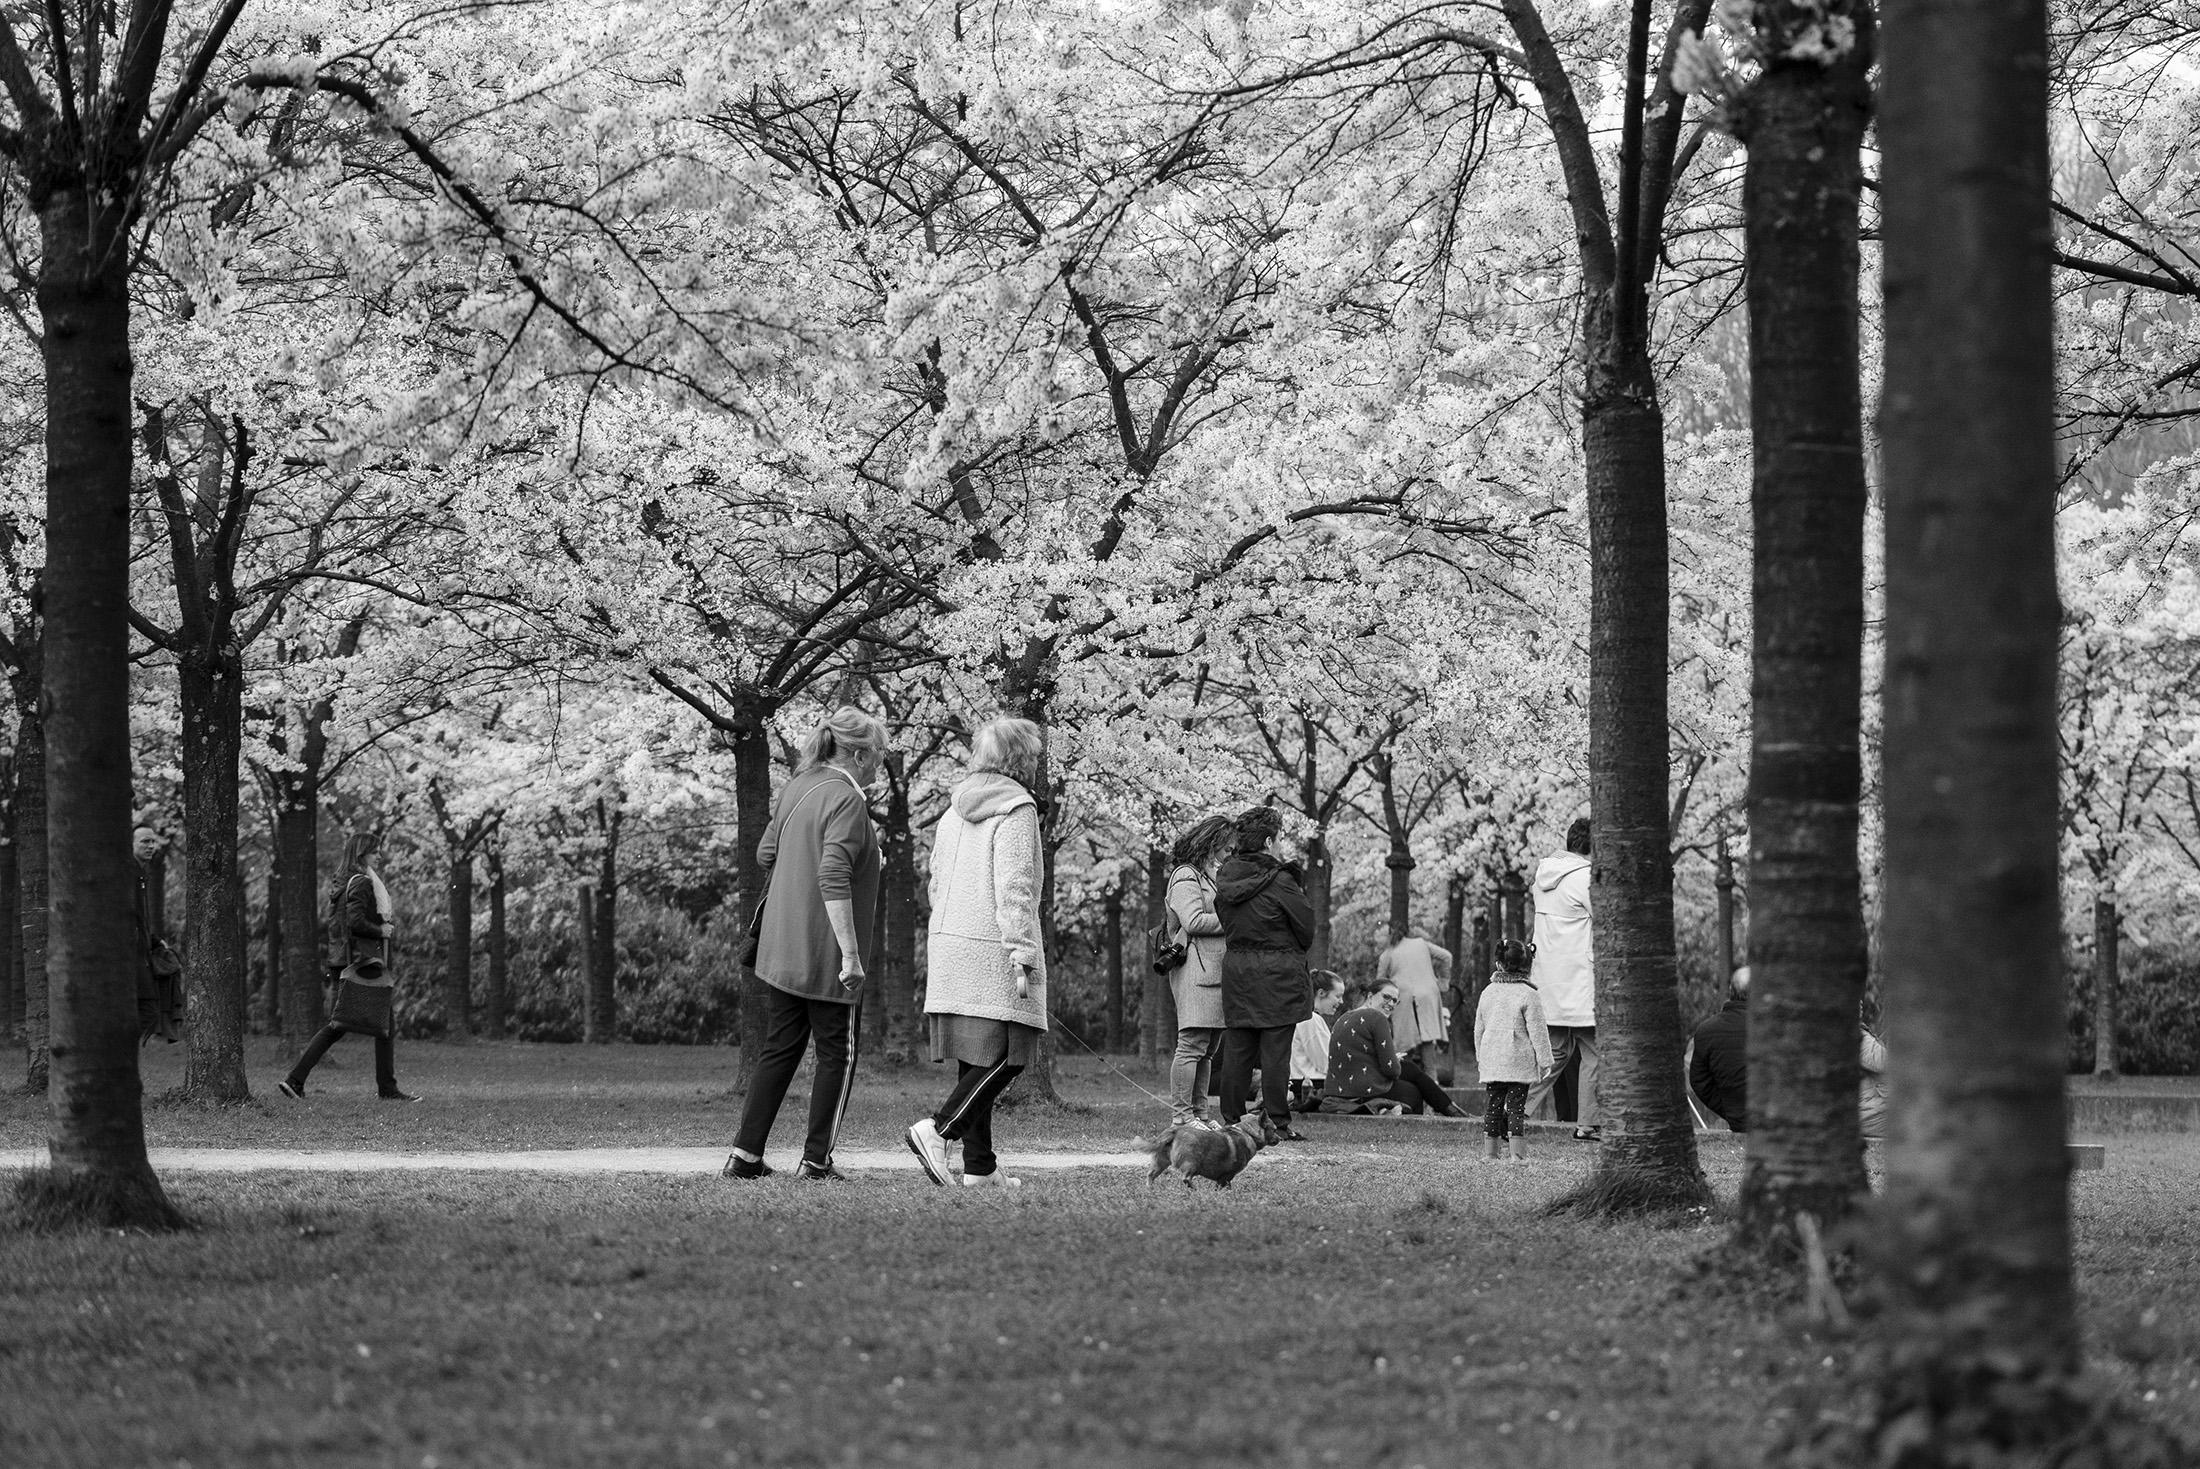 hanami sakura cherry blossom spring people park